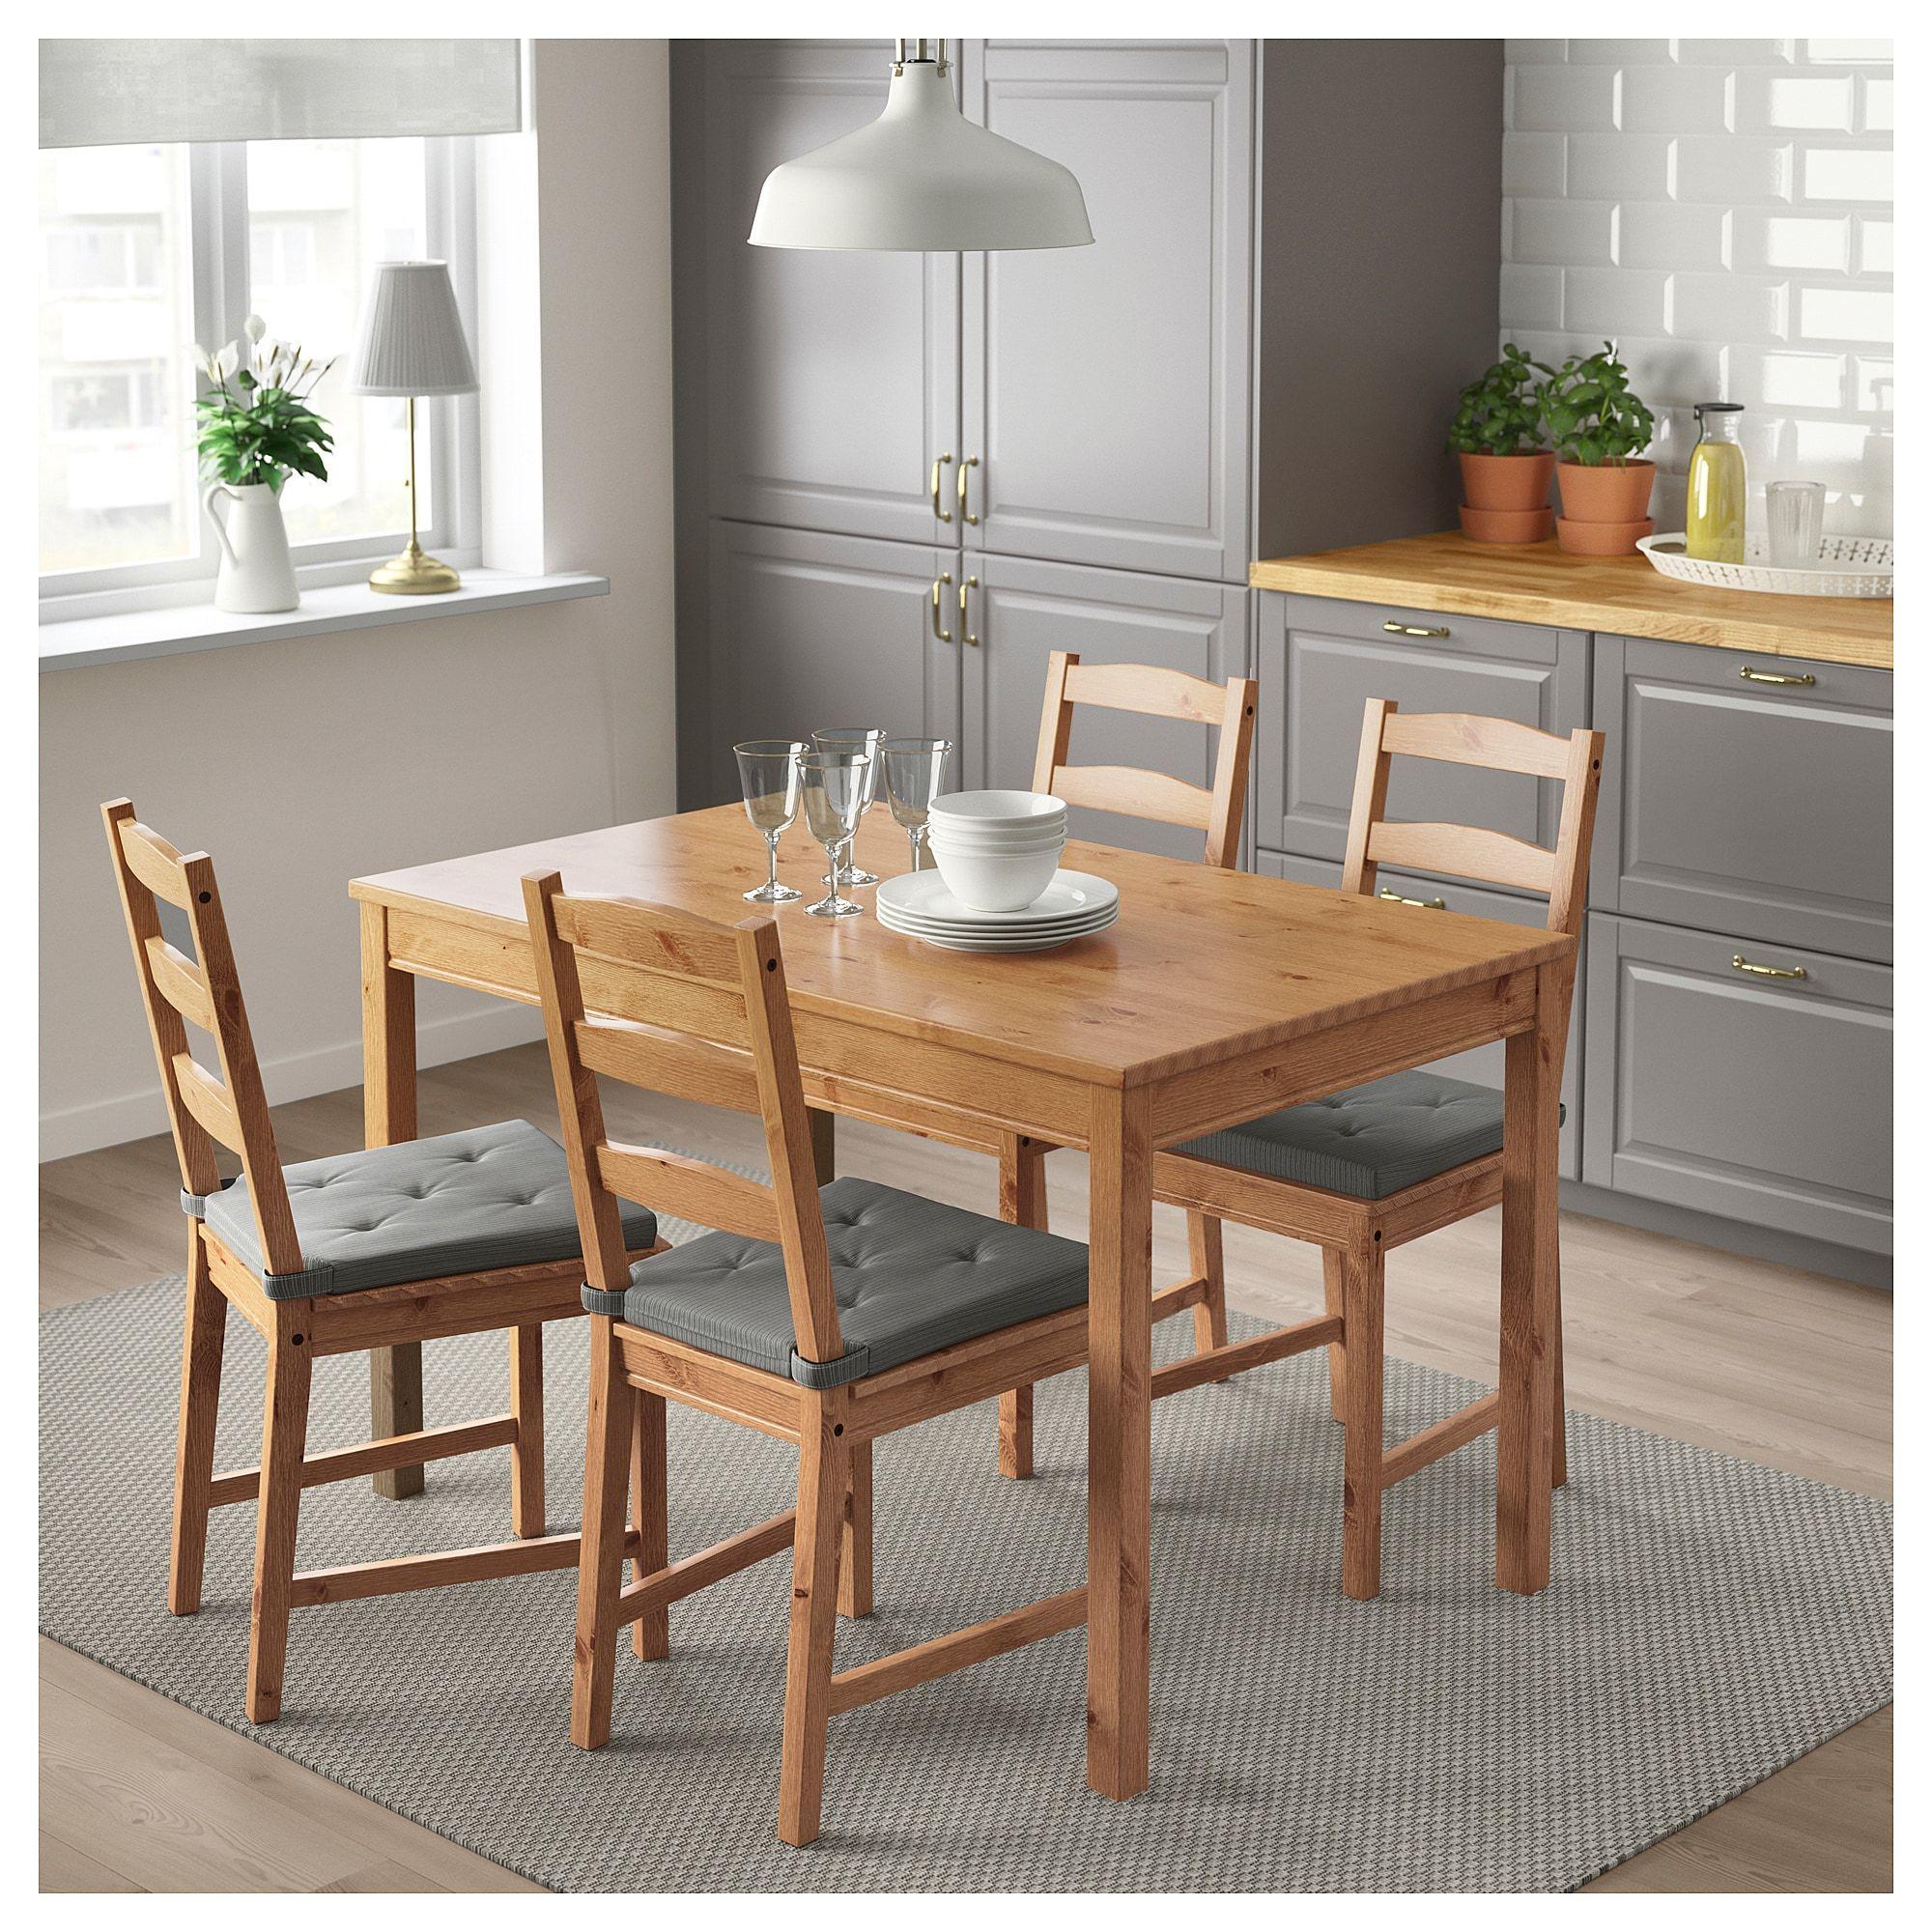 Jokkmokk Table And 4 Chairs Antique Stain Ikea Small Dining Antique Stain Jokkmokk